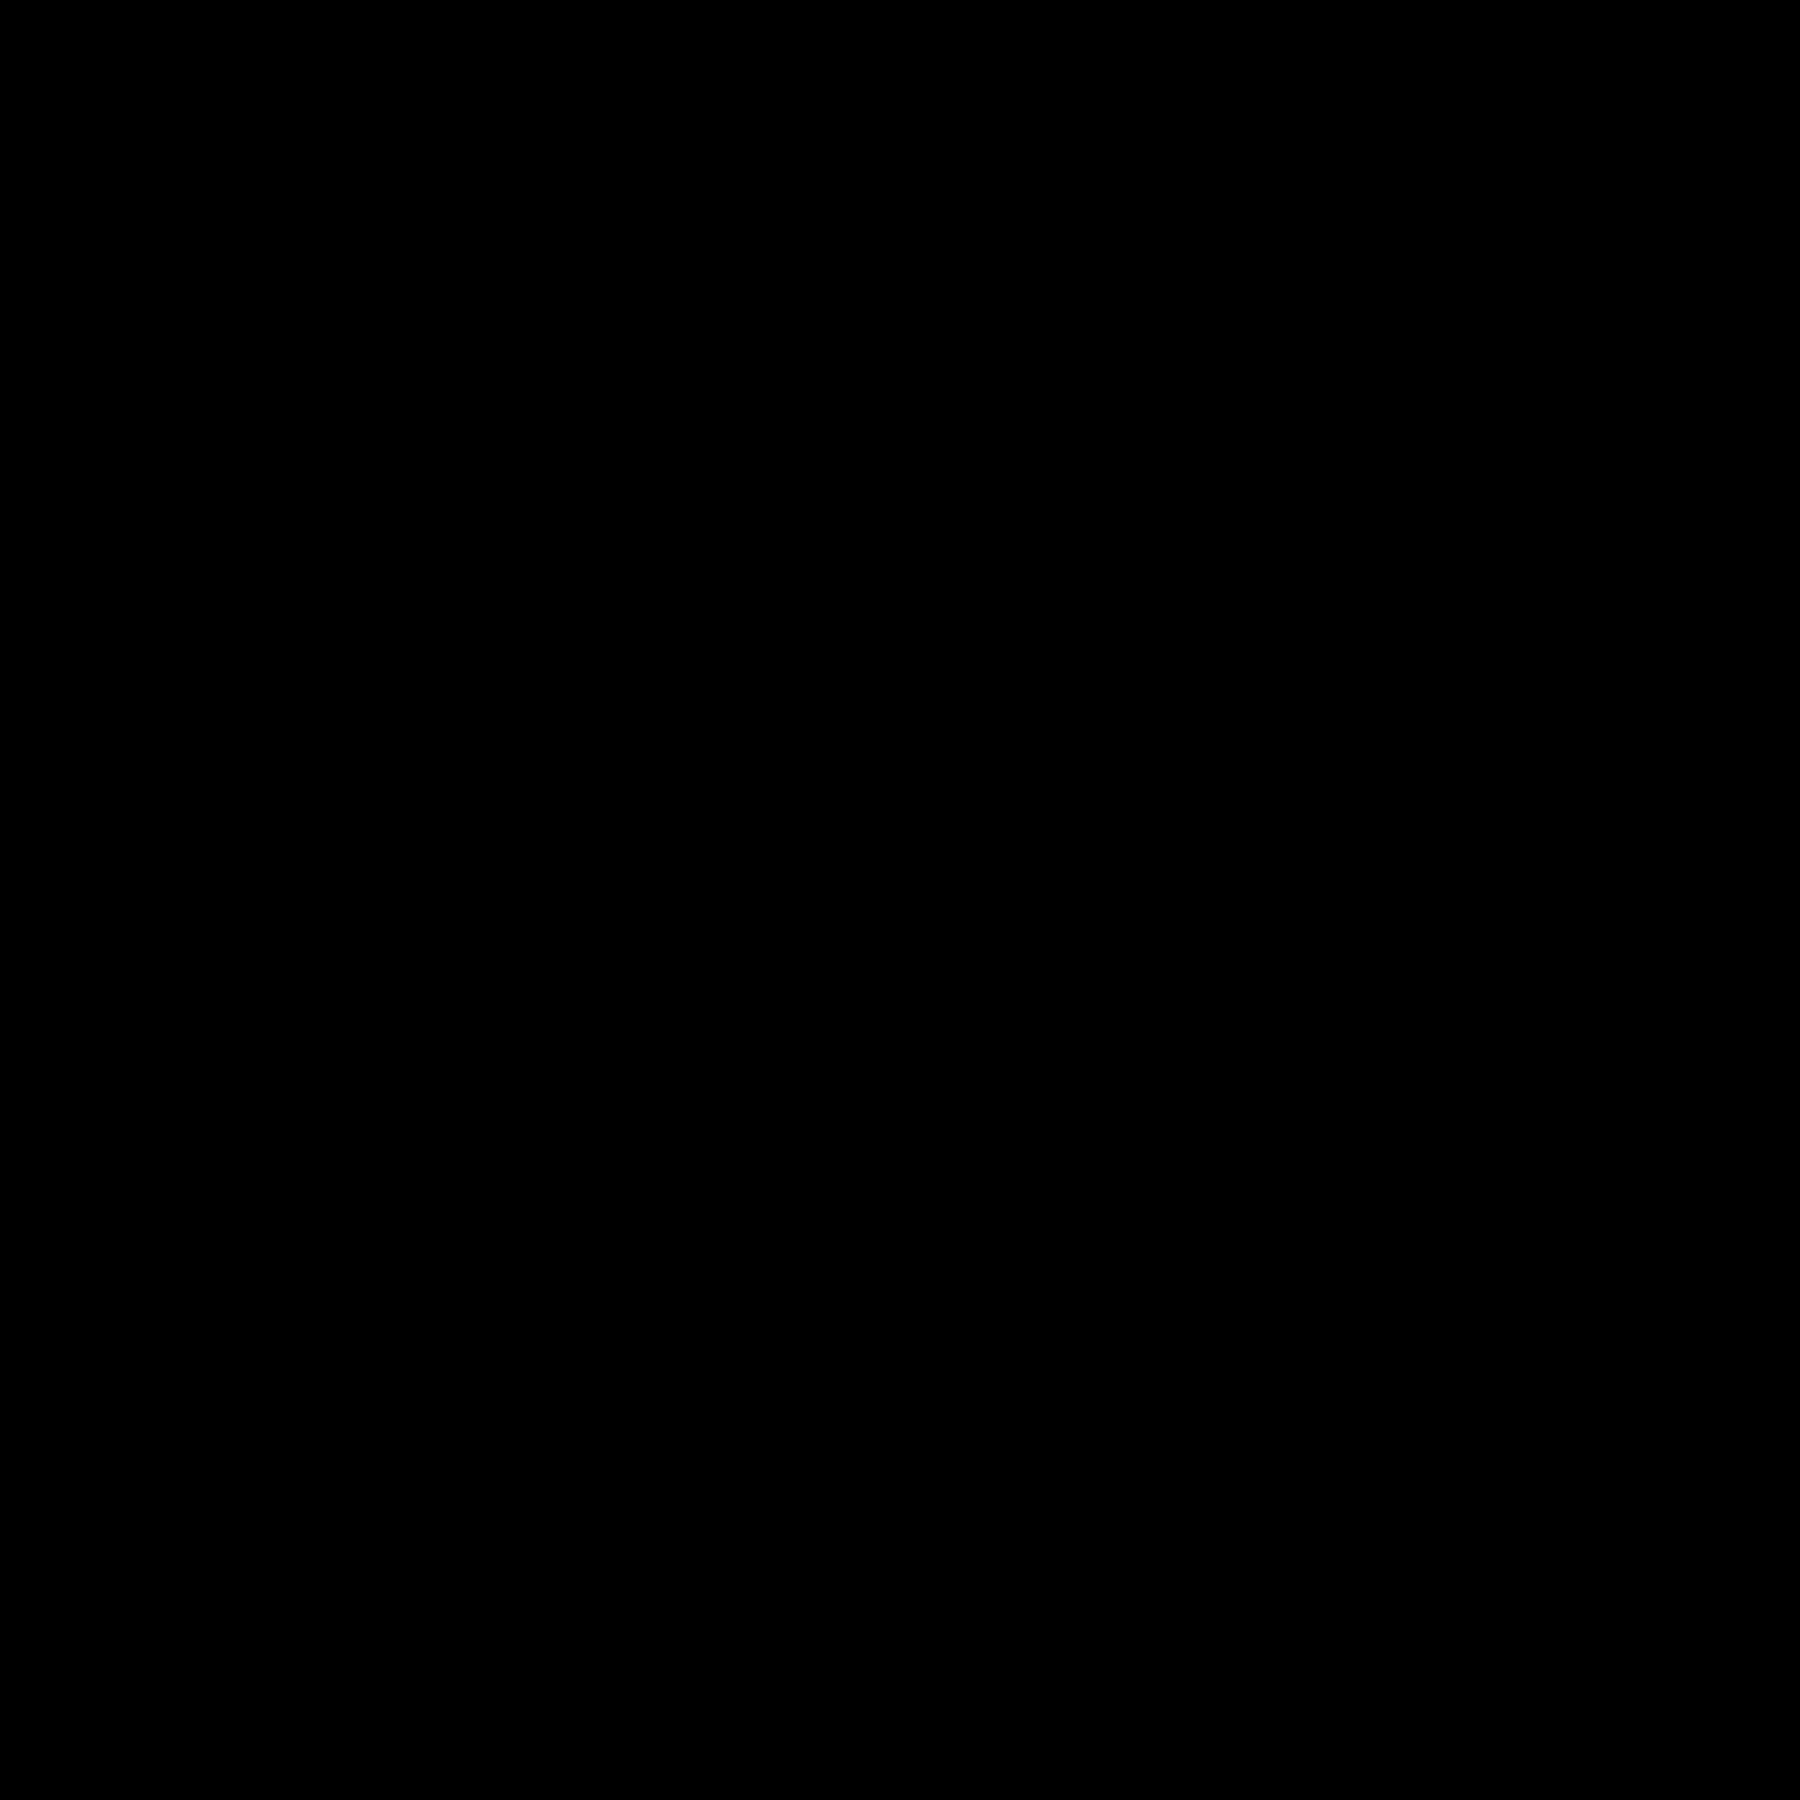 Basic Symbols-12.png